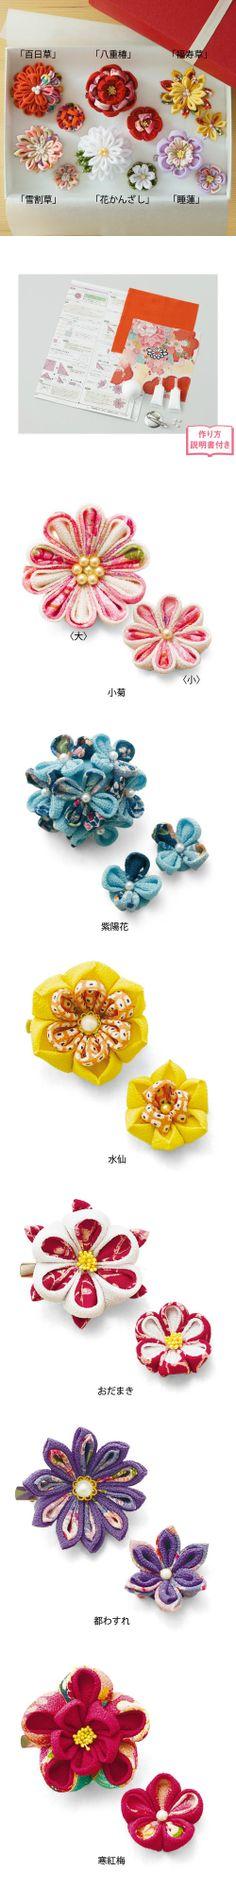 DIY Kanzashi Fabric Flower (Part 1)